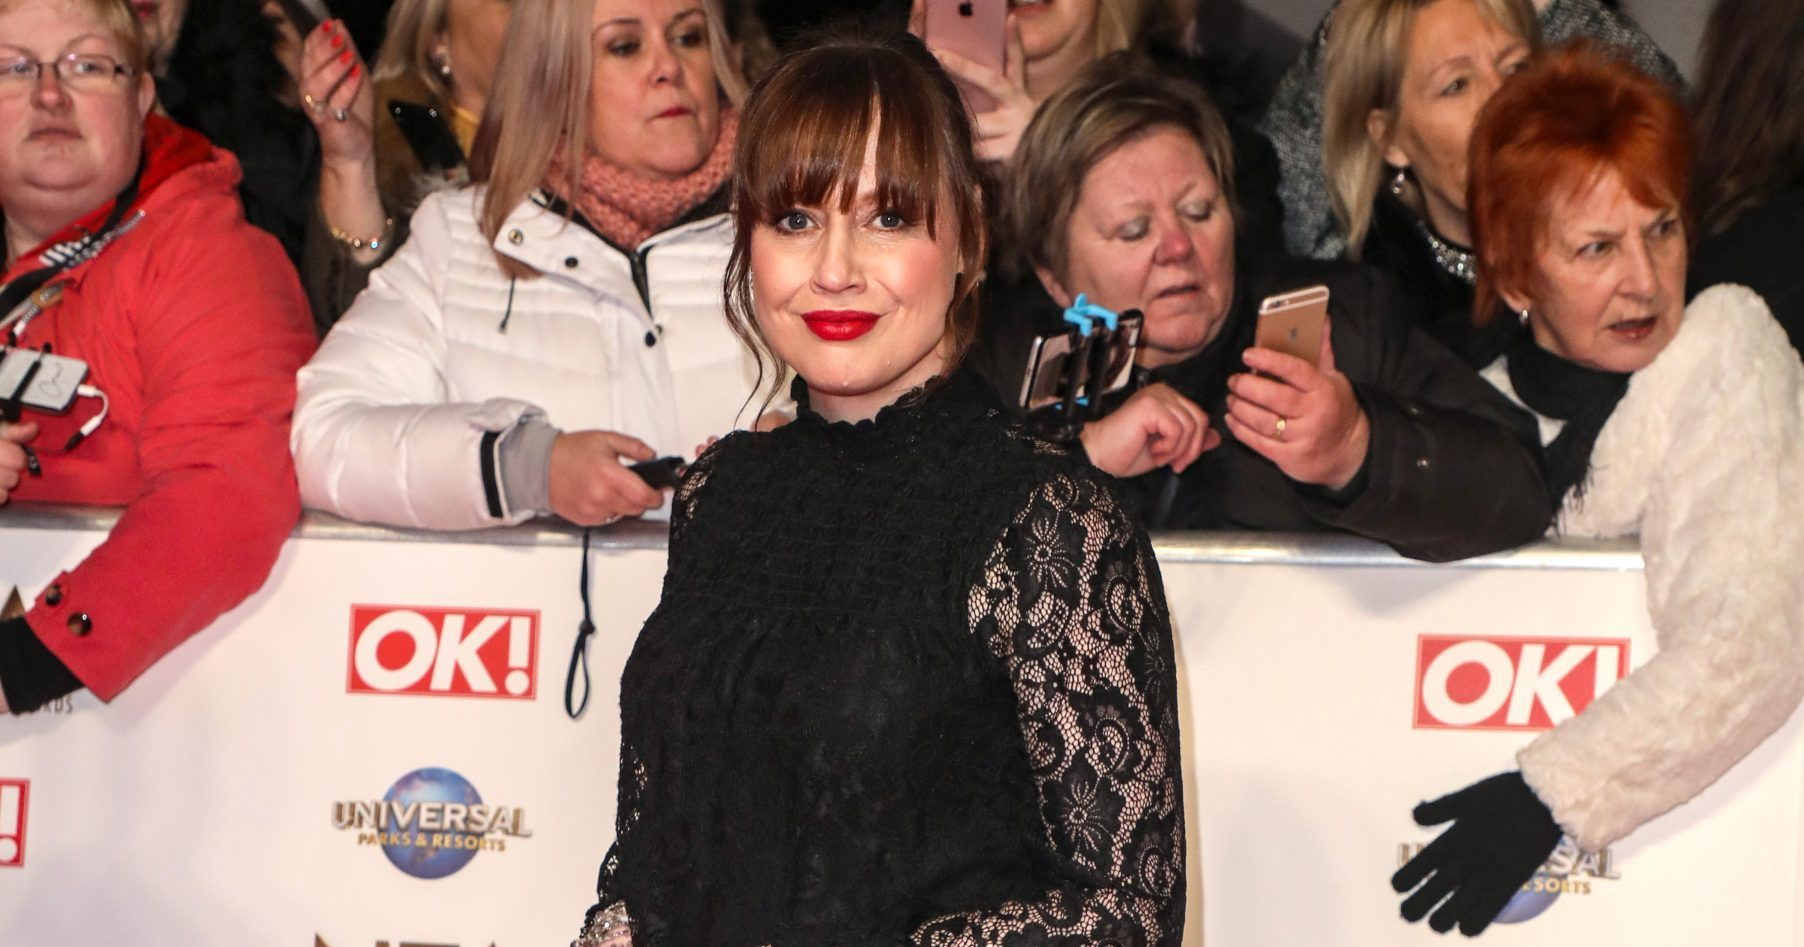 Emmerdale actress Karen Blick reveals amazing Groupon deal she got on her wedding